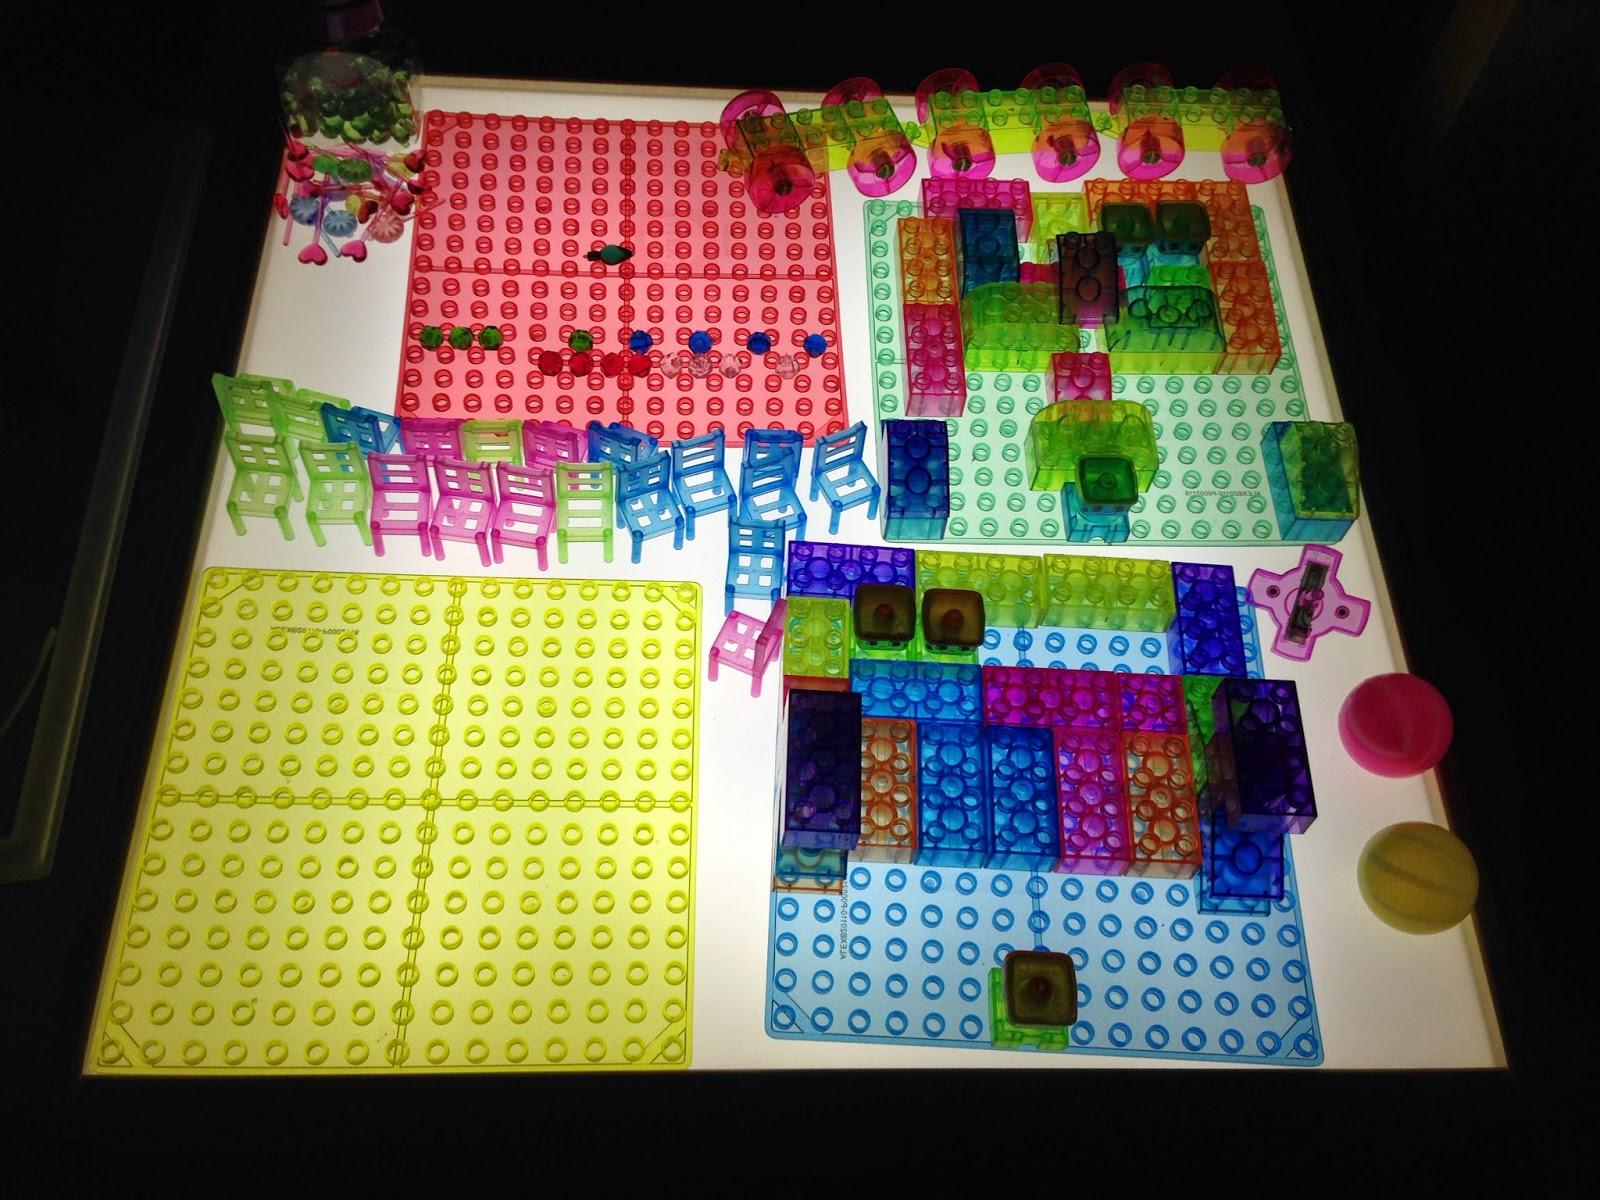 lego light table block play